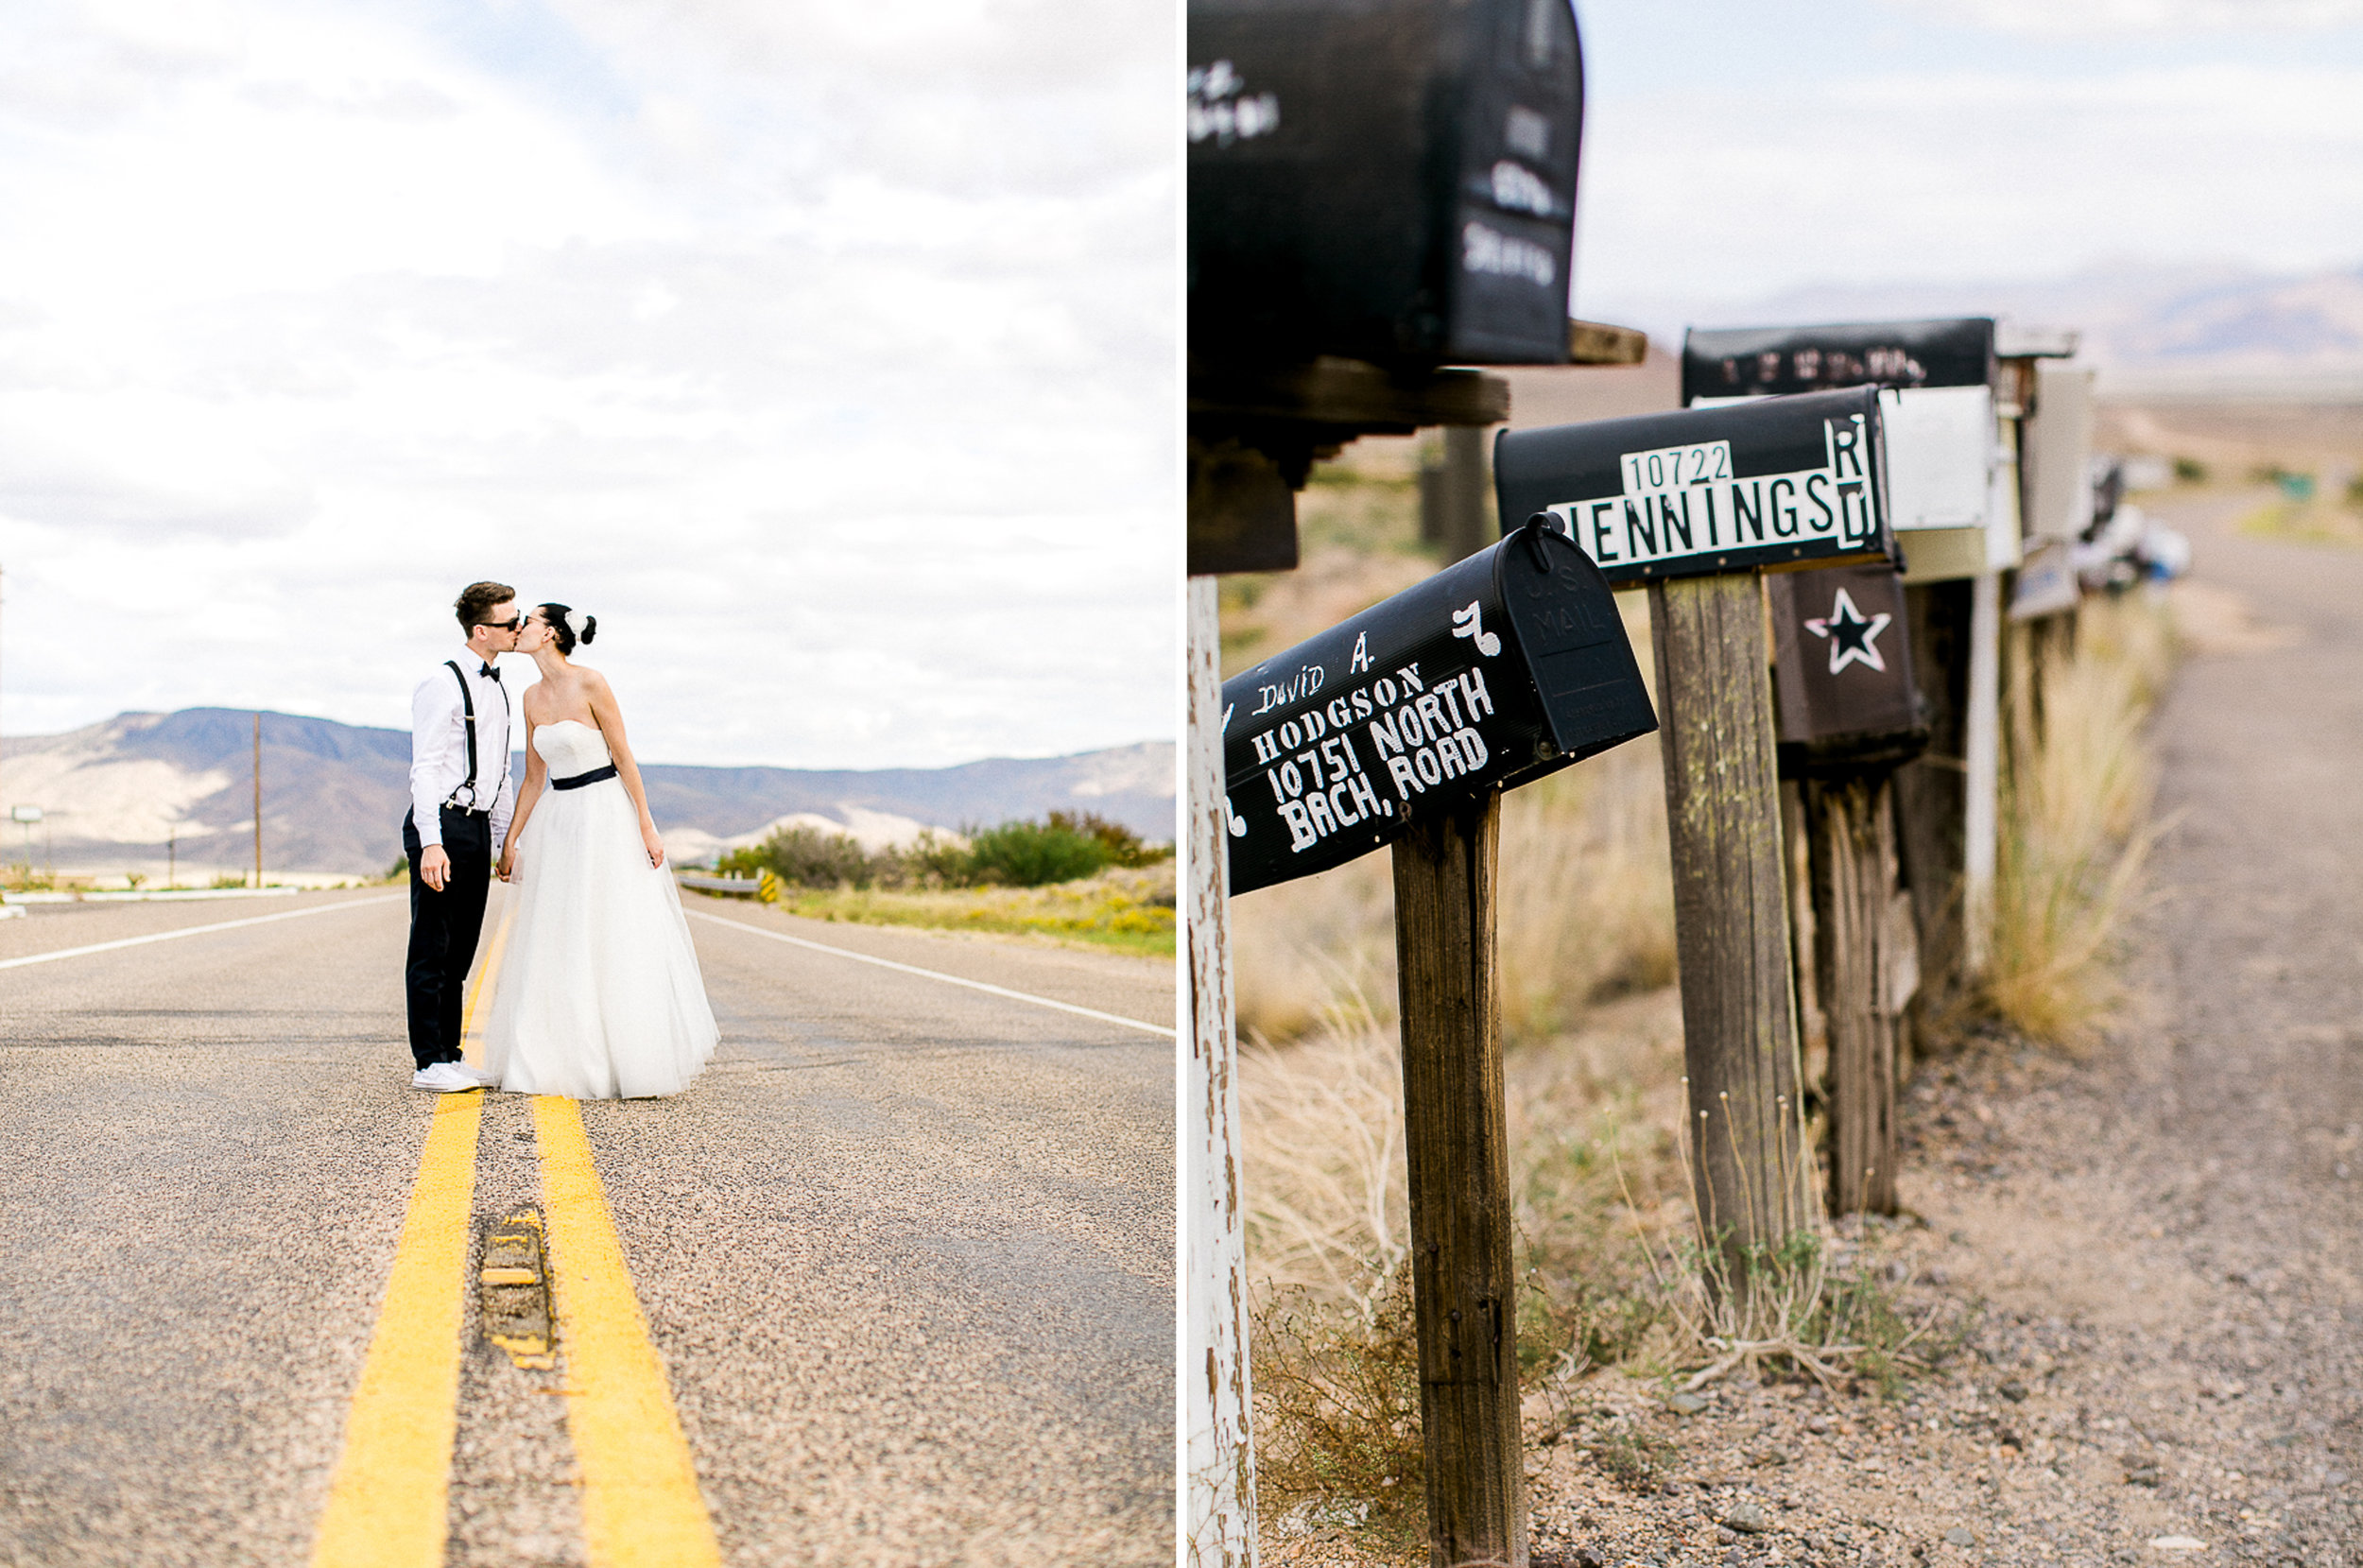 Susi-und-Danu-Hochzeit-Theresa-Pewal-Fotografie-fine-art-7-3.jpg